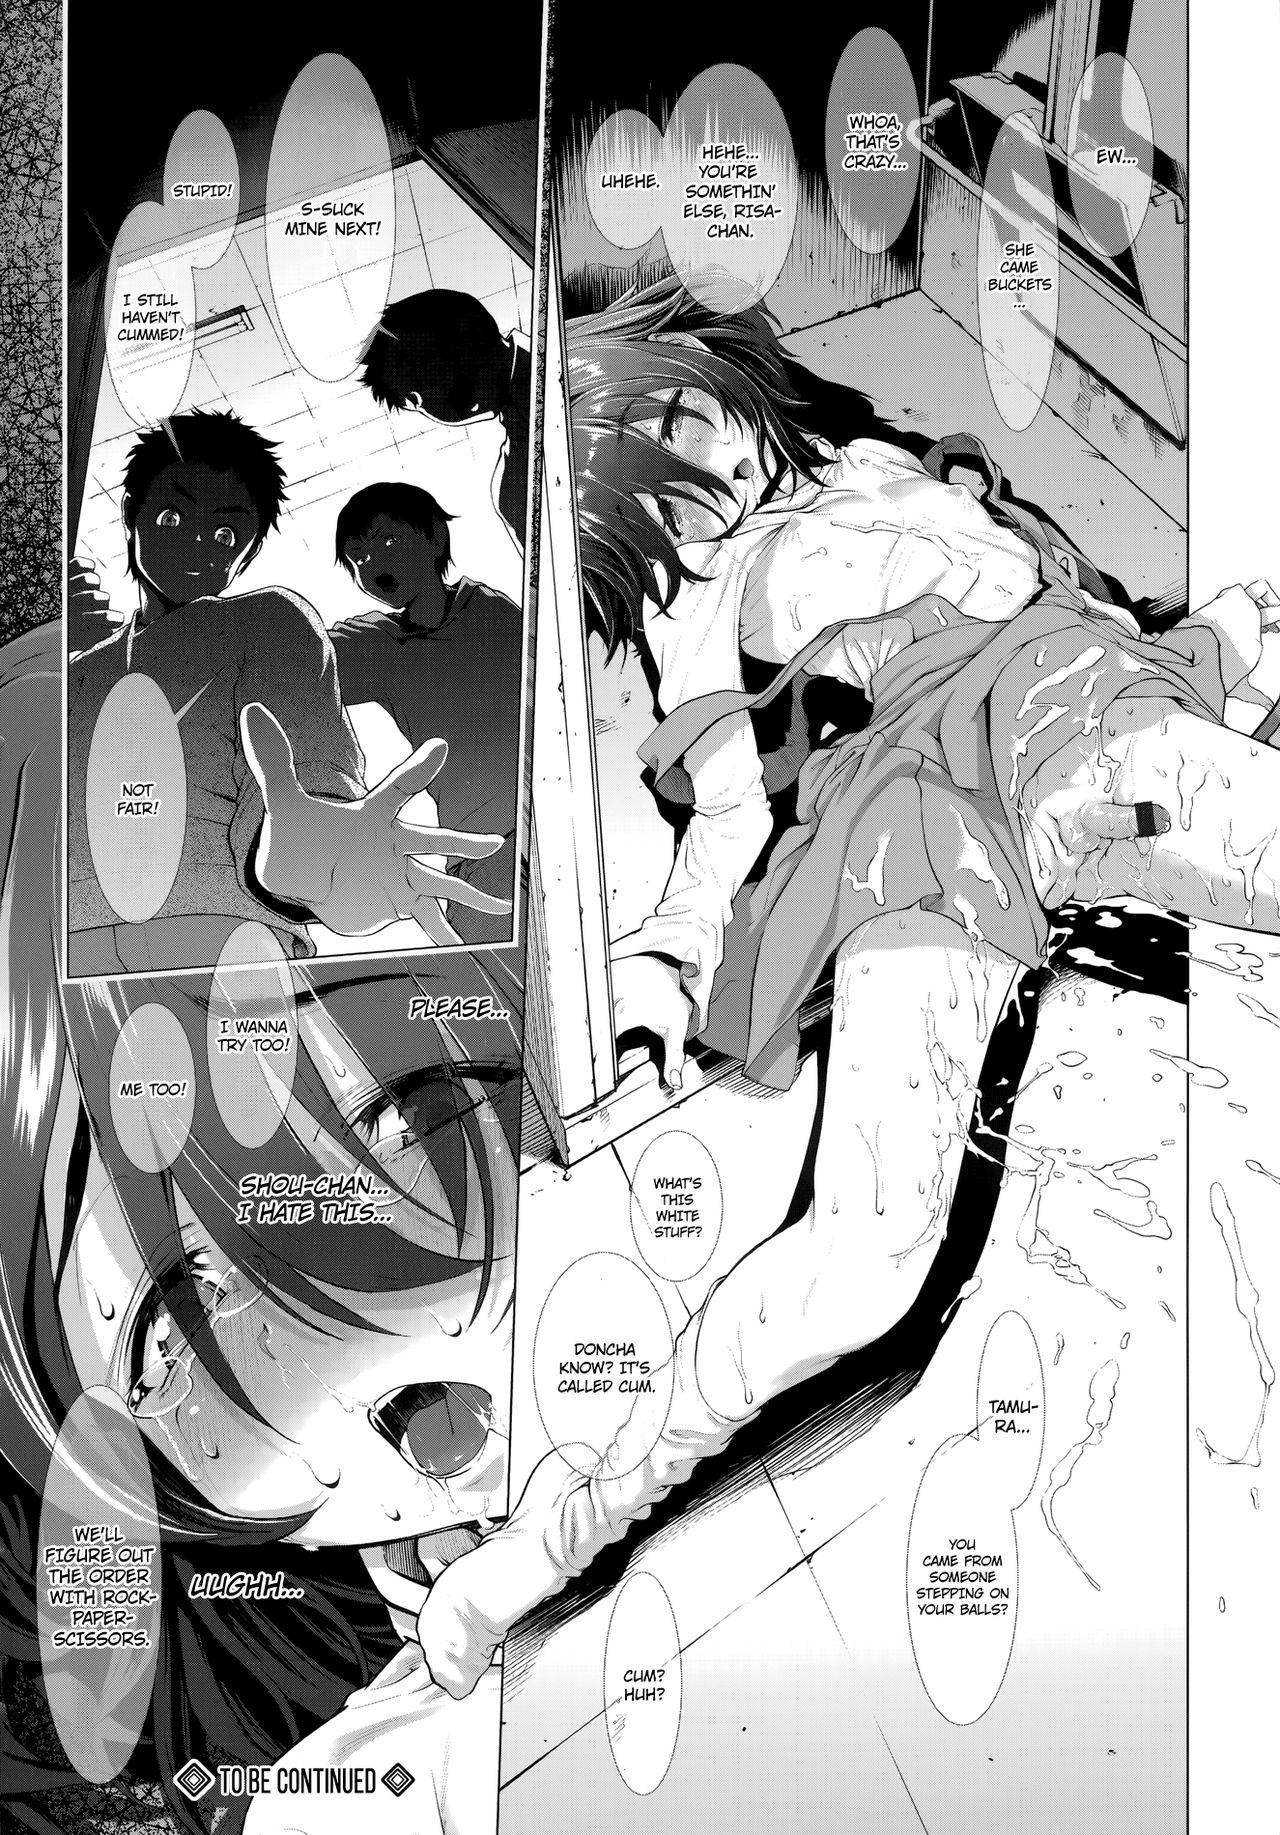 [Sannyuutei Shinta] Chinpotsuki Ijimerarekko | «Dickgirl!», The Bullying Story - Ch. 1-4 [English] [34th squad] 35